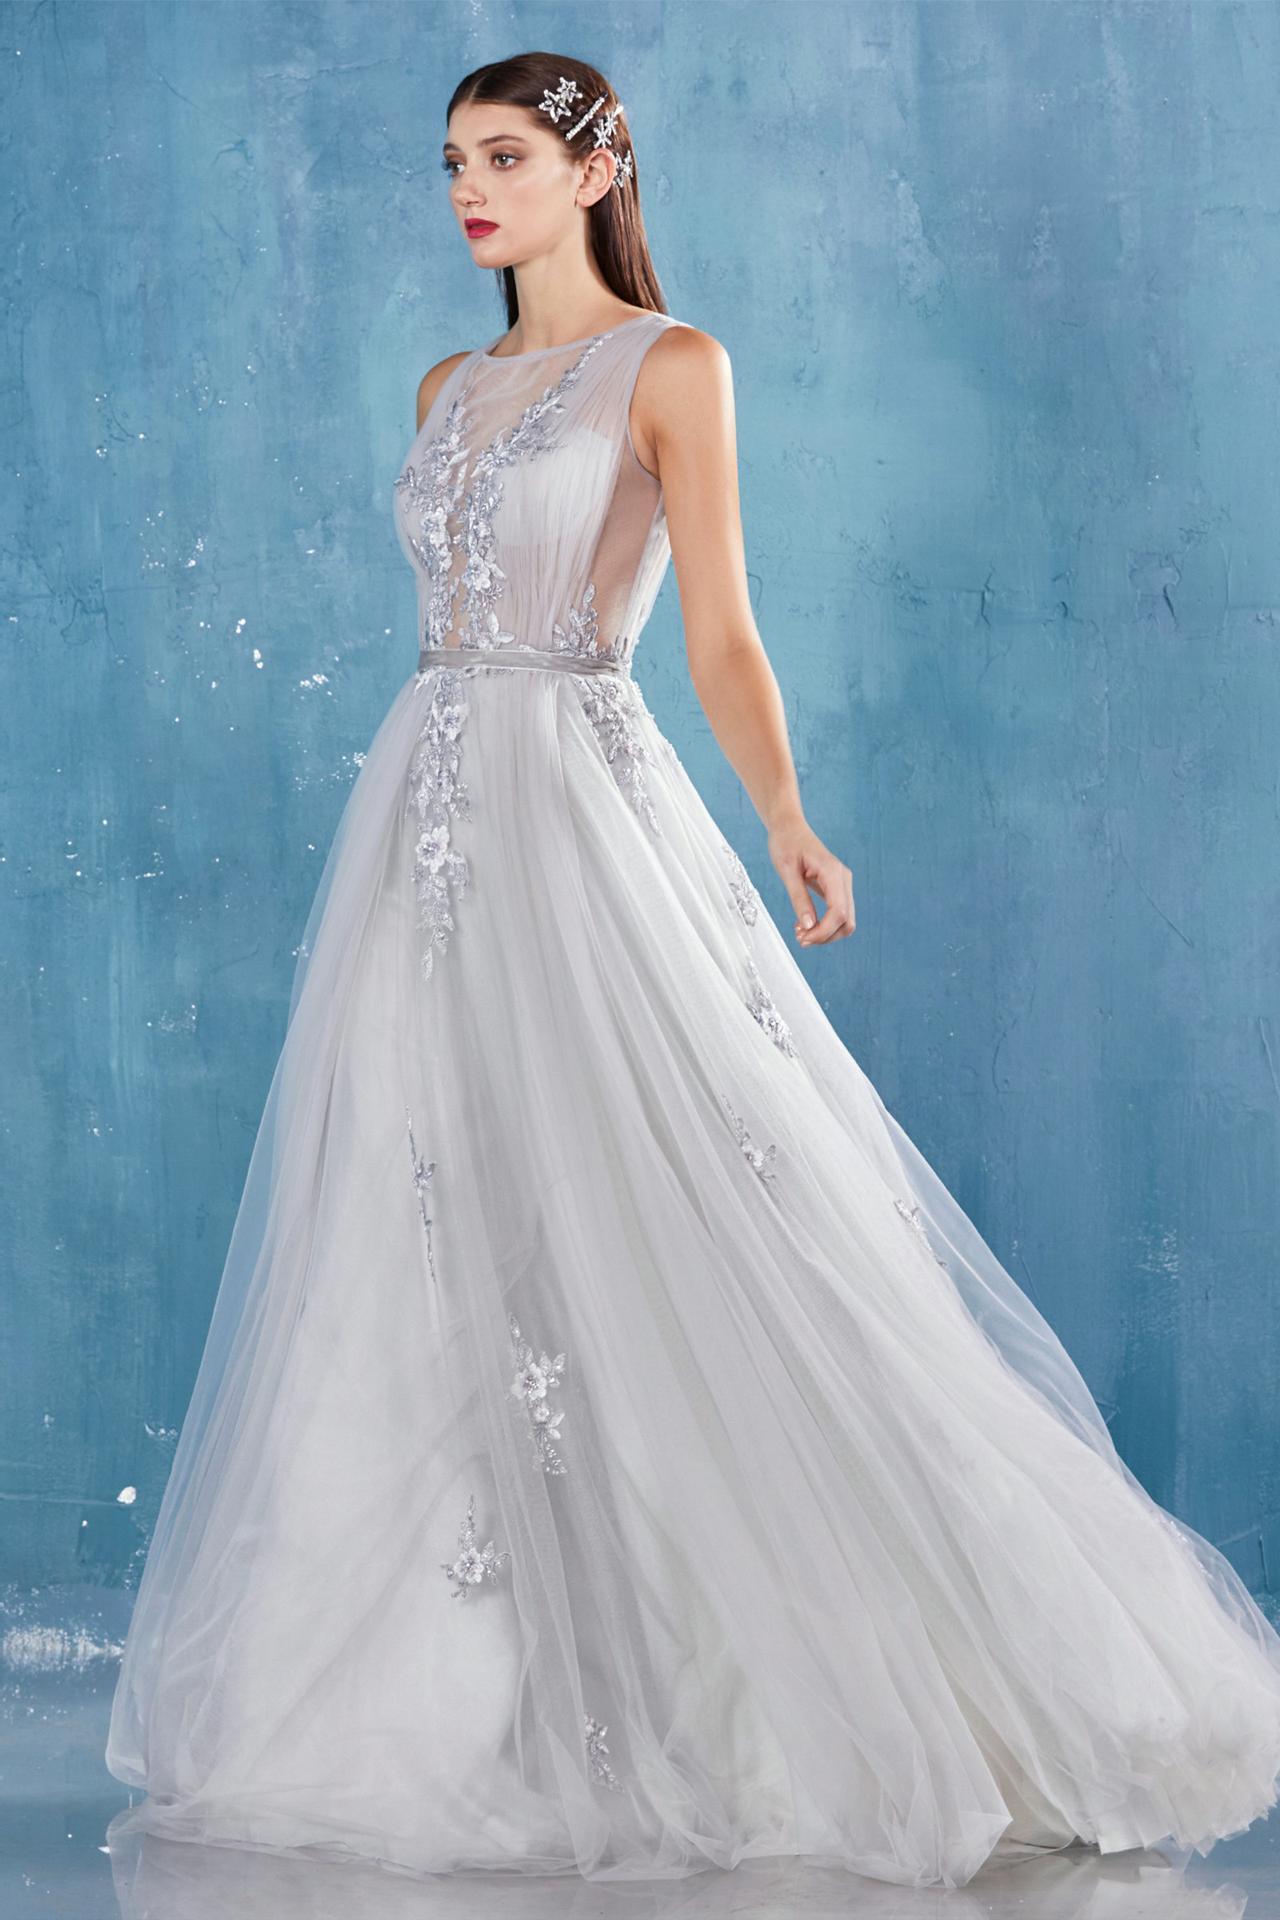 Nové spoločenské šaty :) - Obrázok č. 39